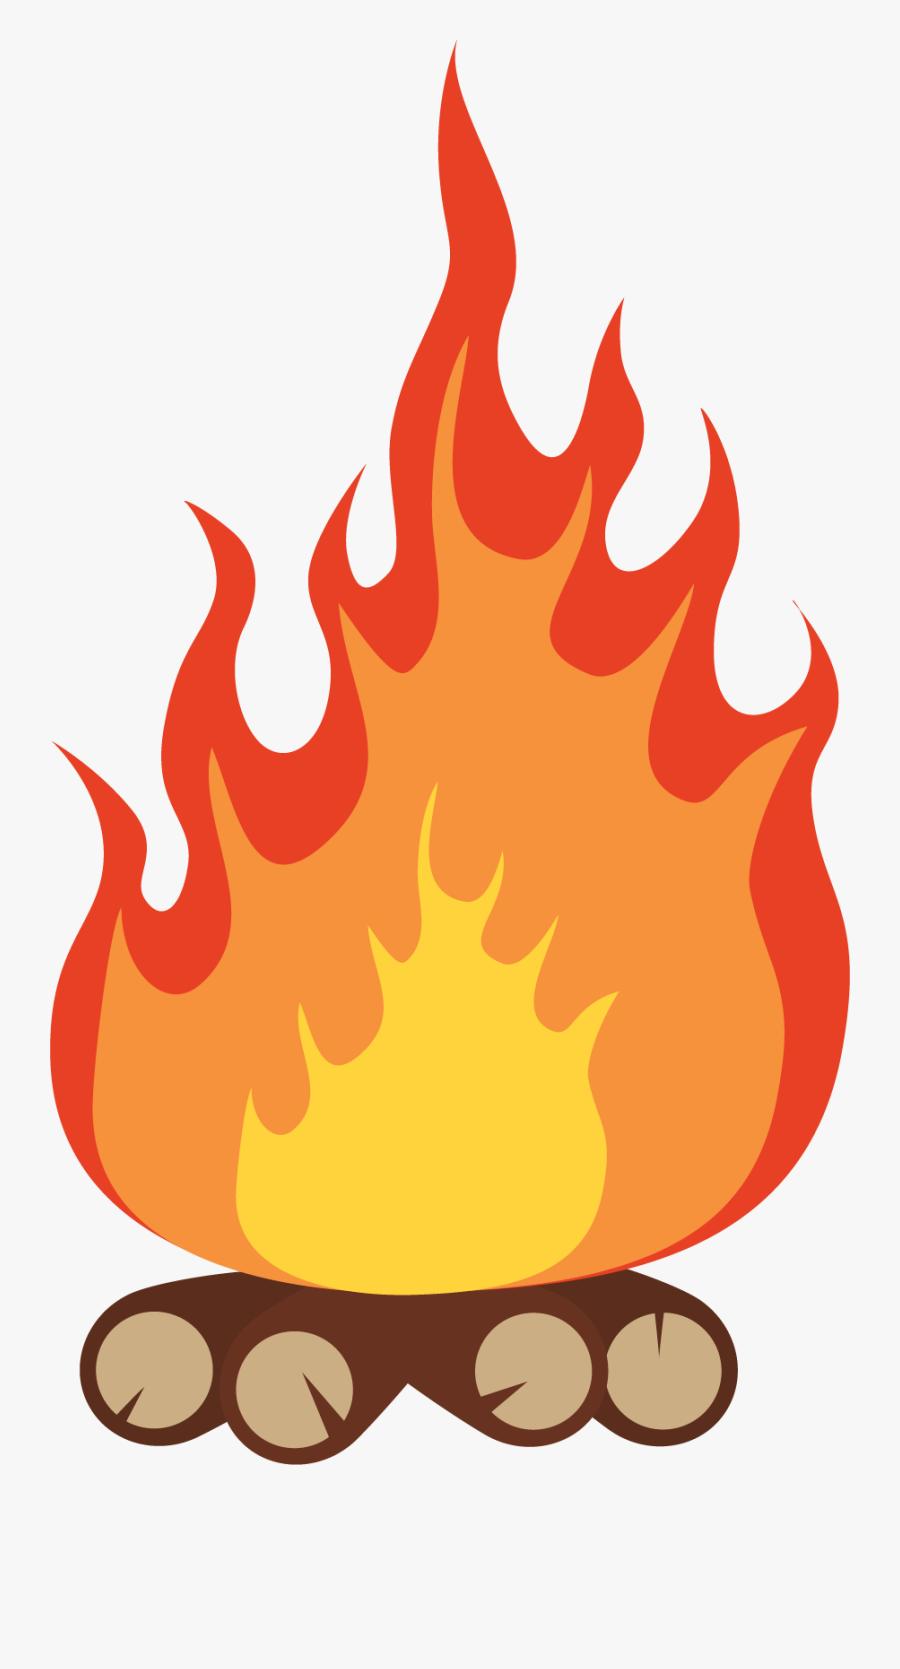 Camp Fire Cartoon Png, Transparent Clipart